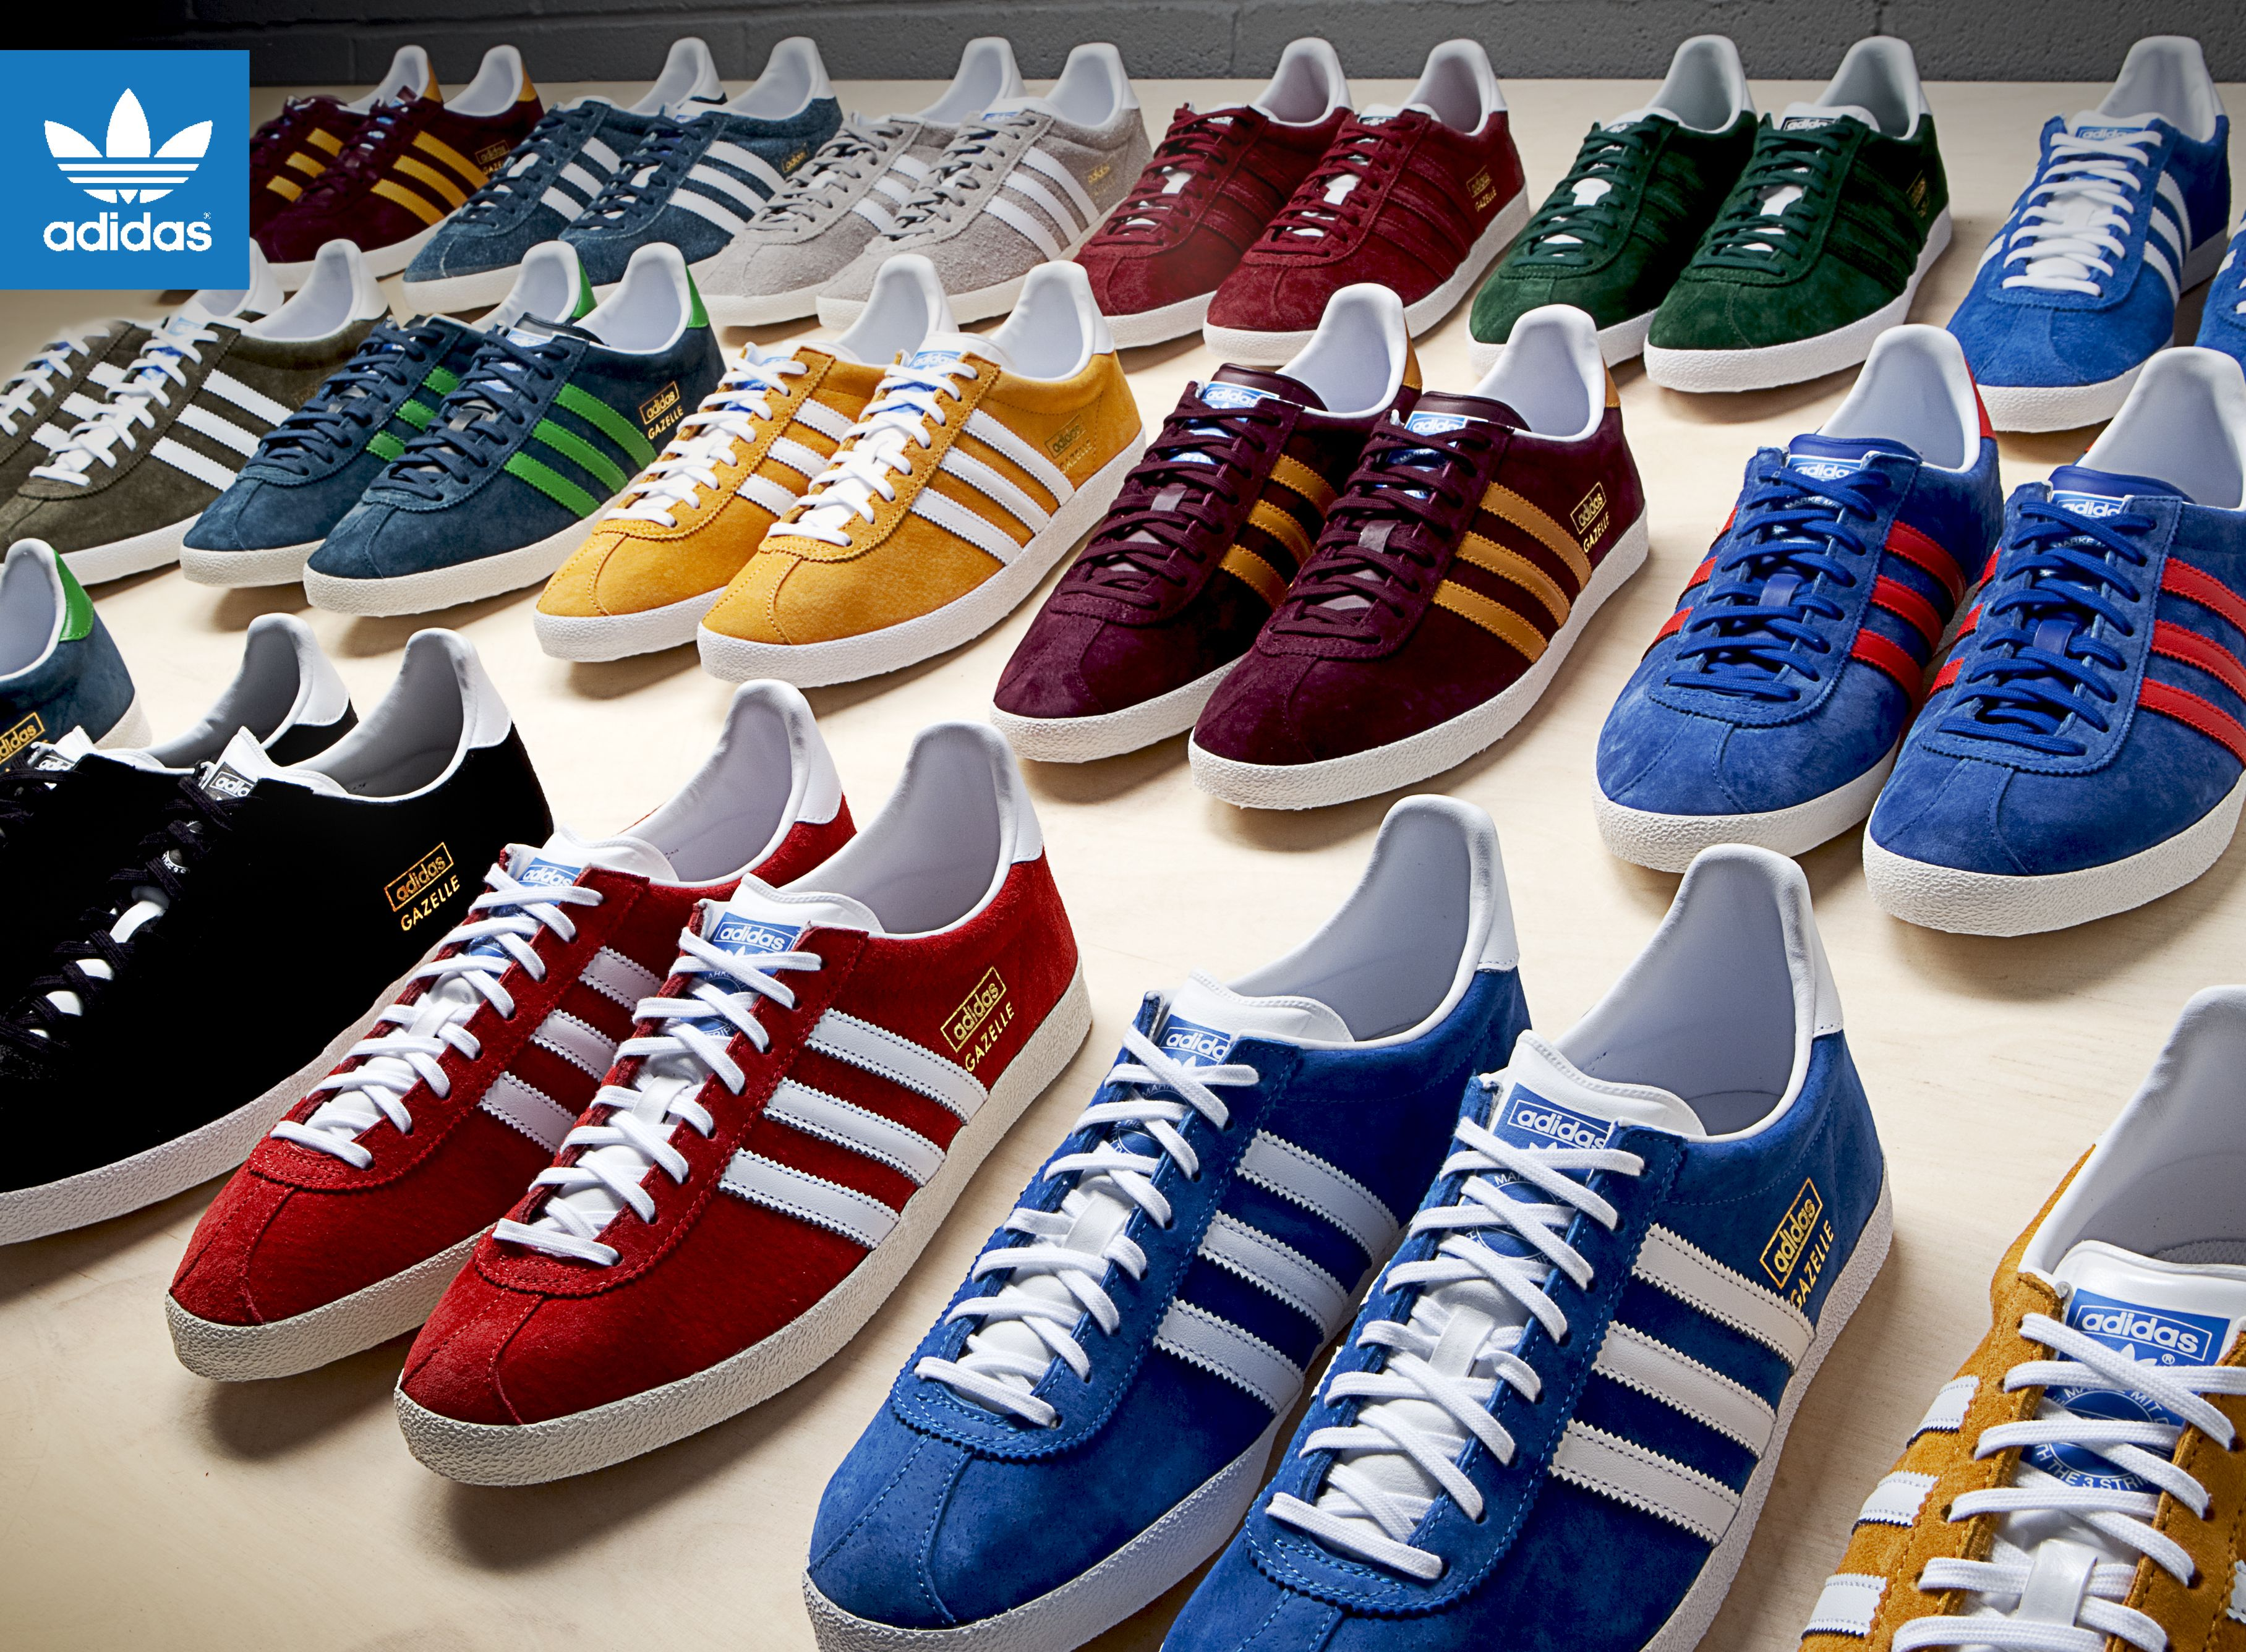 premium selection 1401d ad8cd adidas Gazelle OG httpwww.prodirectselect.comdefault.aspx